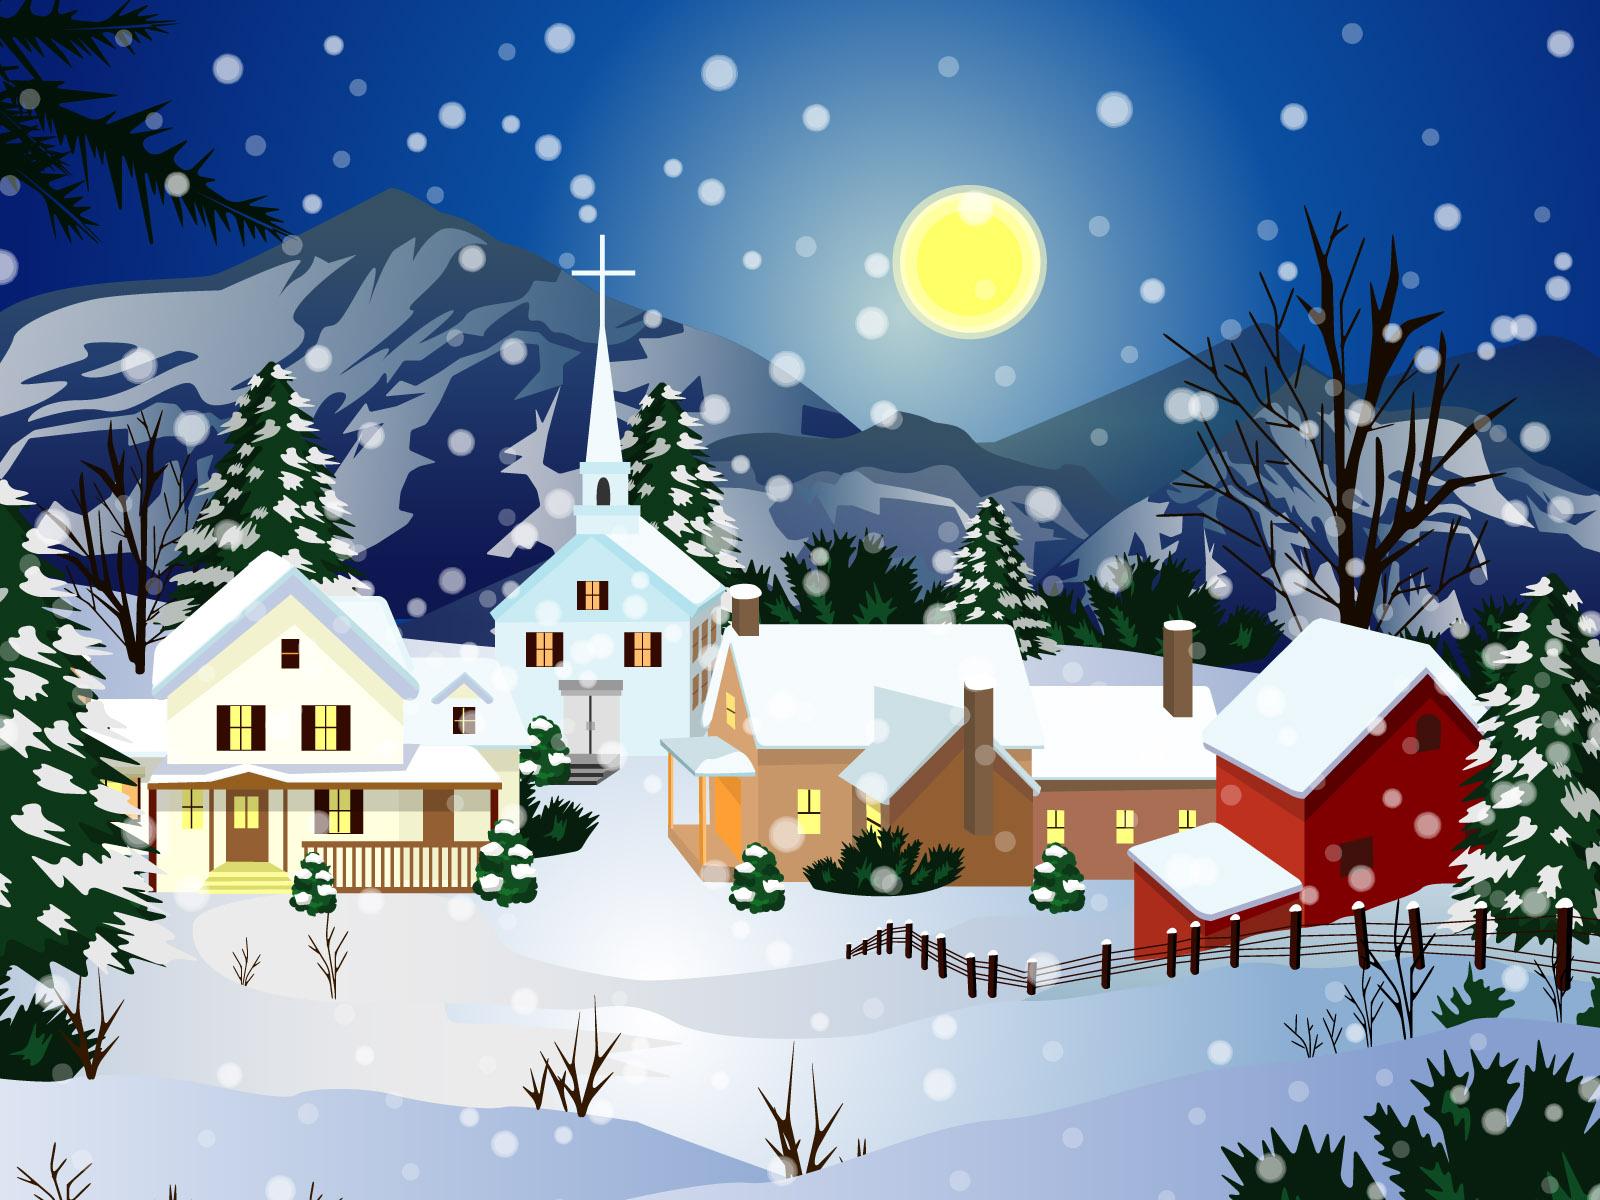 Christmas Wallpapers Widescreen Christmas 1920x1200 Desktop 1600x1200